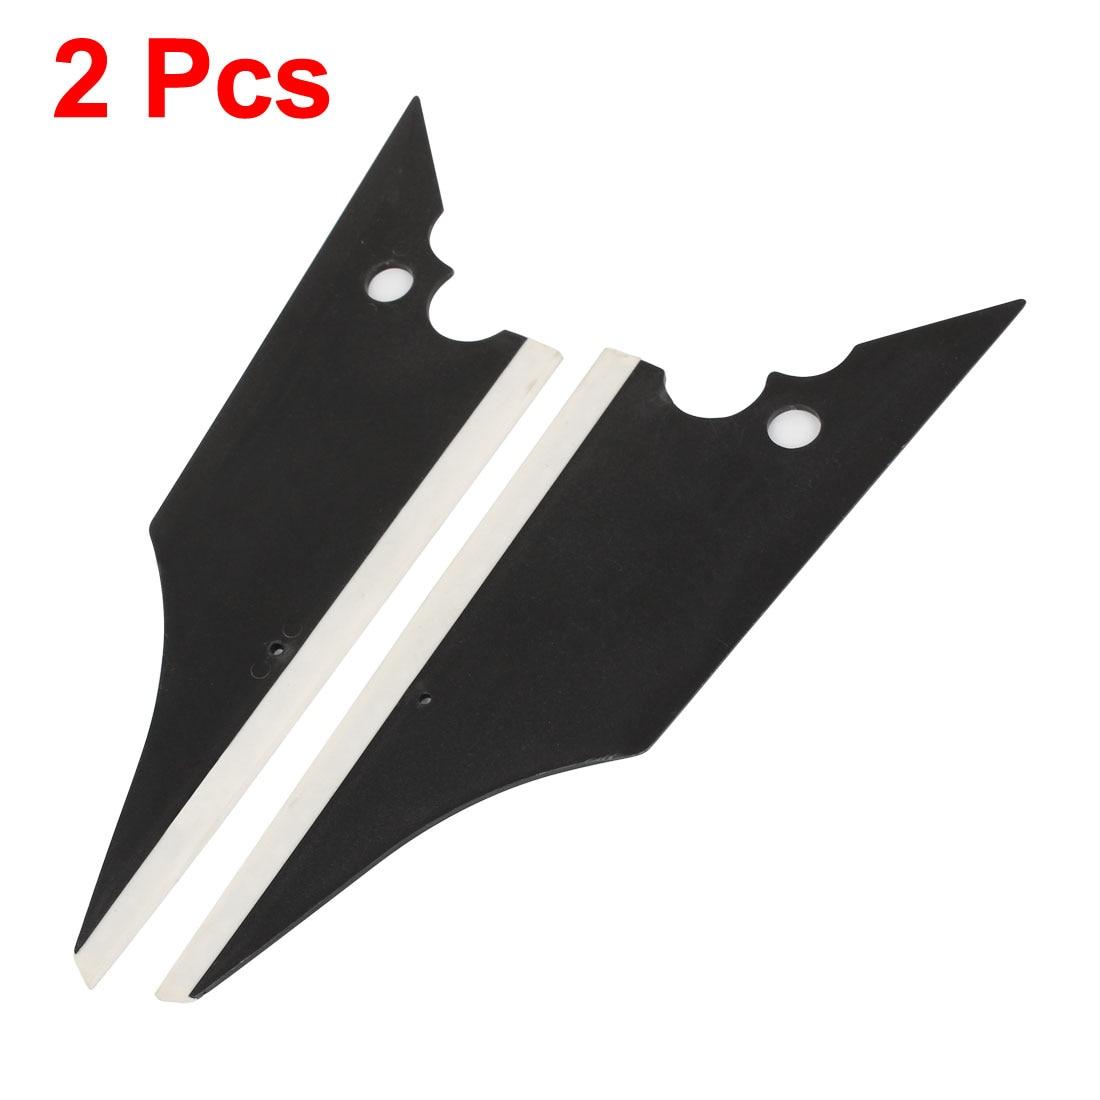 UXCELL 2 Pcs 22.5Cm Long Black White Car Window Film Tint Plastic Scraper Cleaning Tool